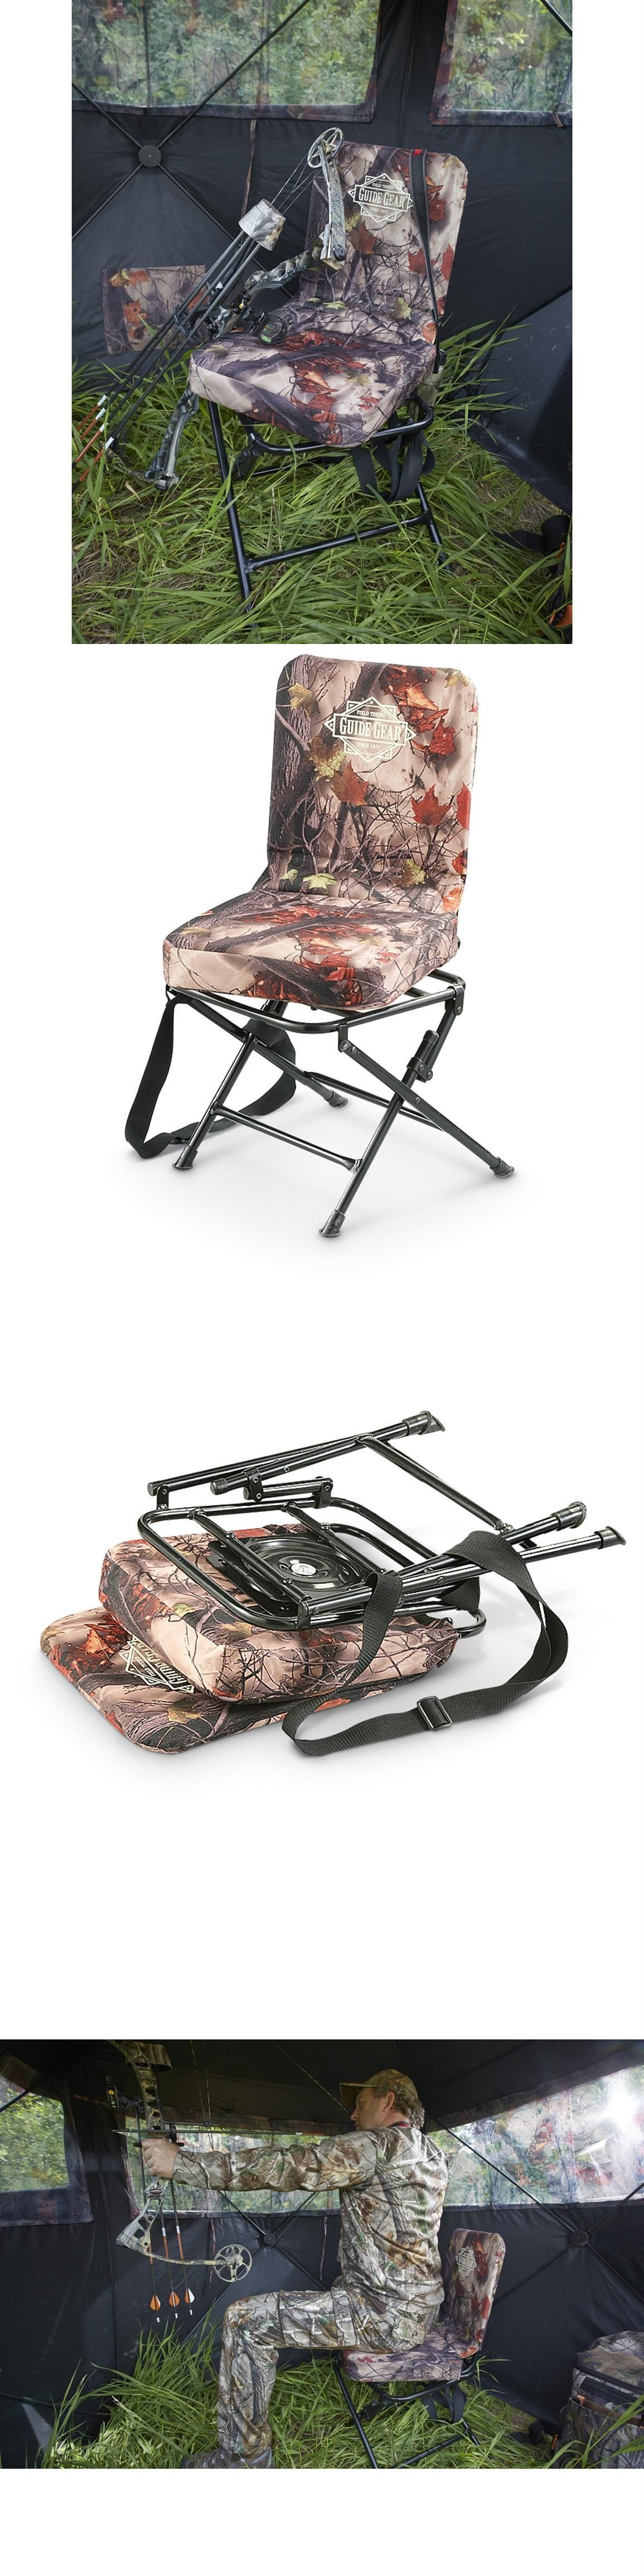 Seats and Chairs Hunting Gear 360 Swivel Hunters Camo